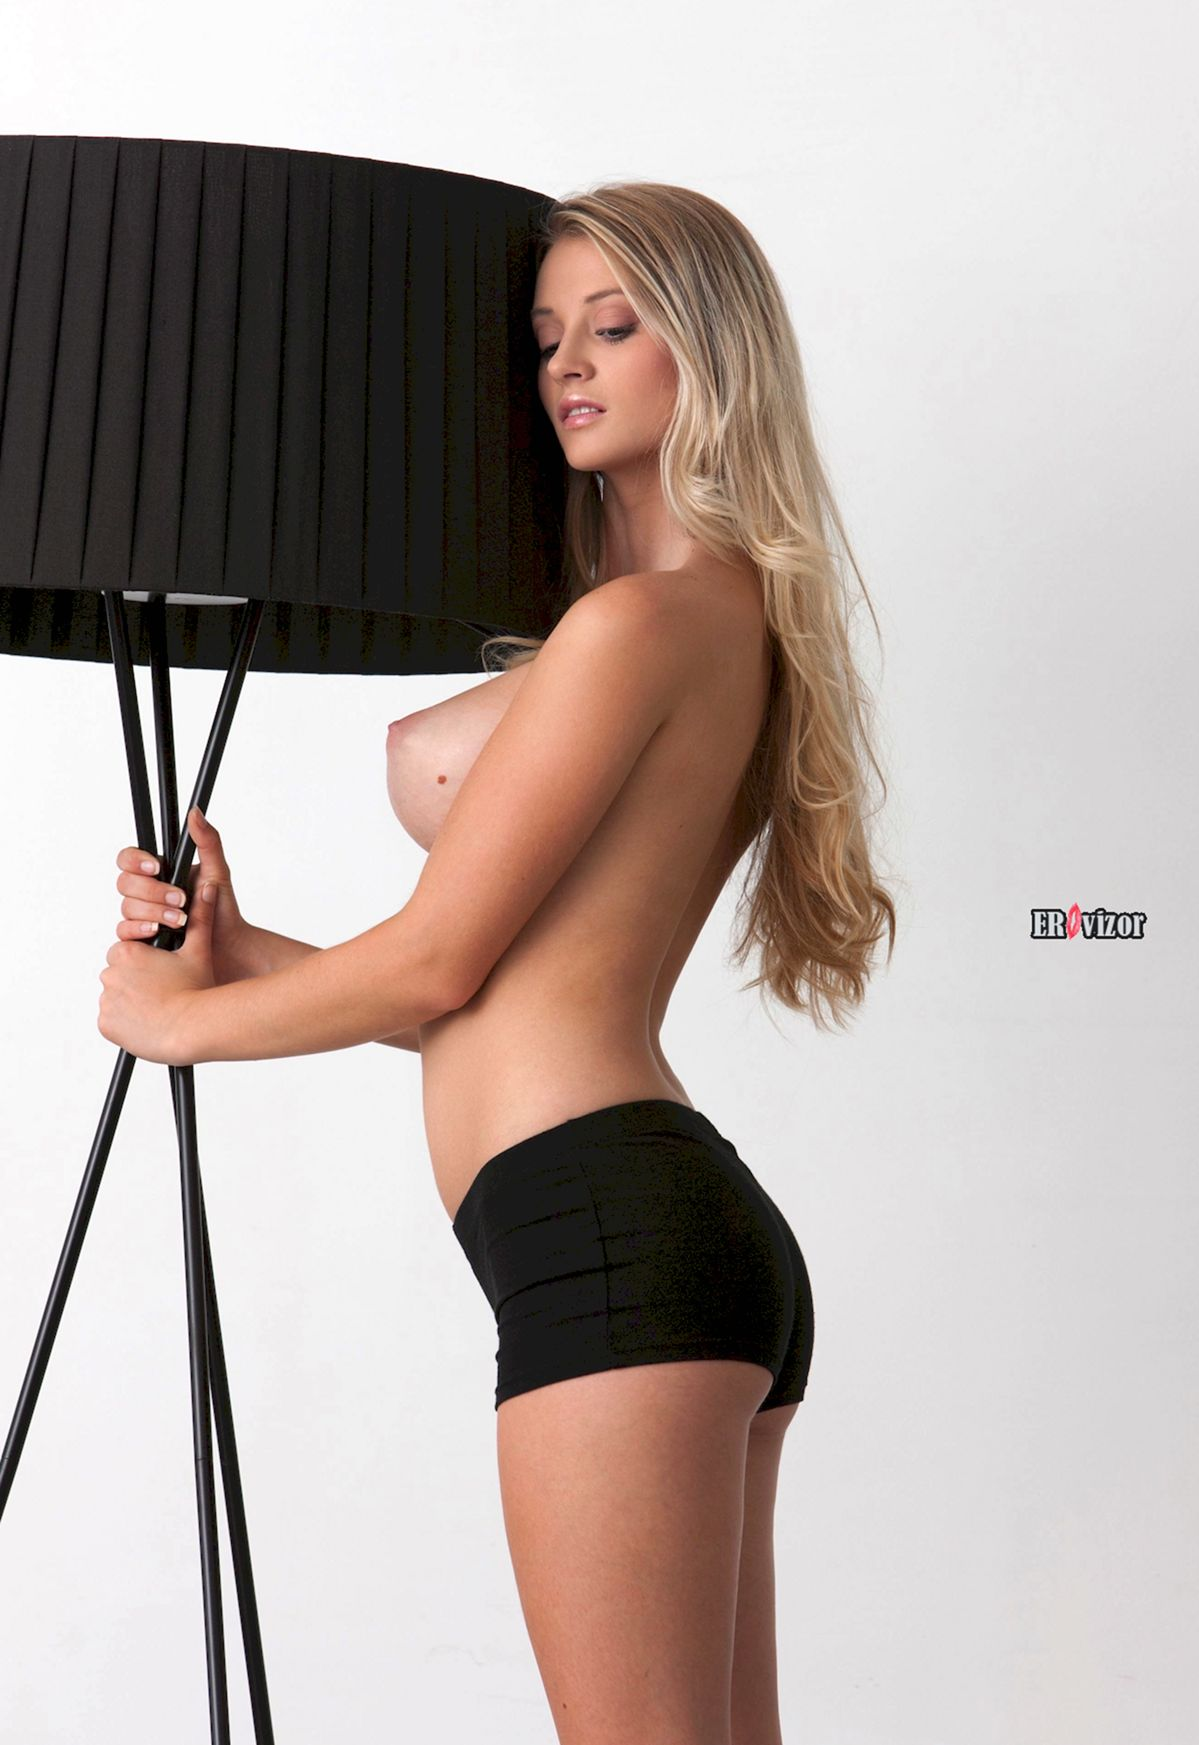 Blonde-Babe-Carisha-with-Big-Tits (2)